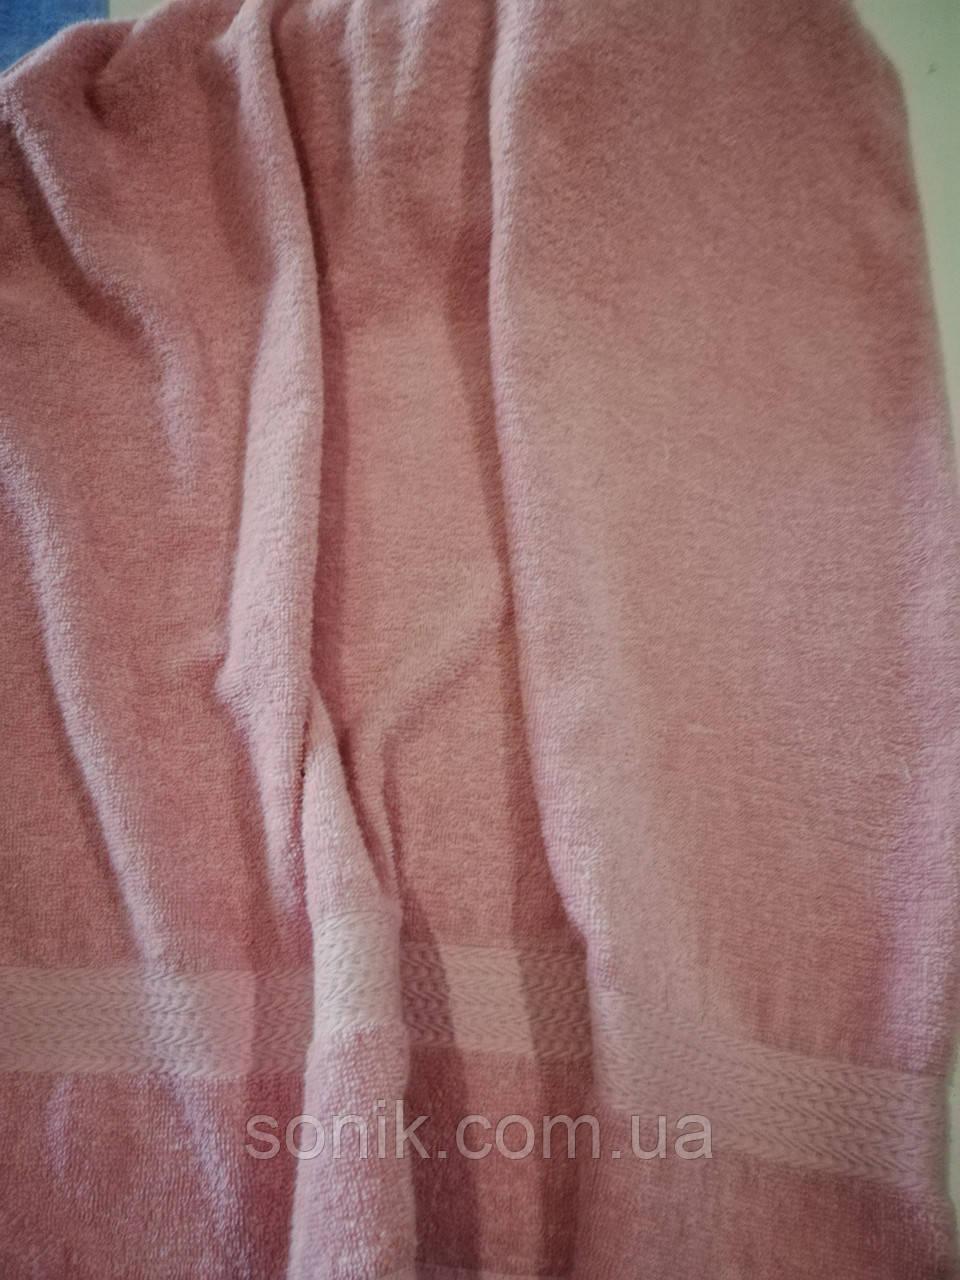 Полотенце махровое бледно-розовое 40*70